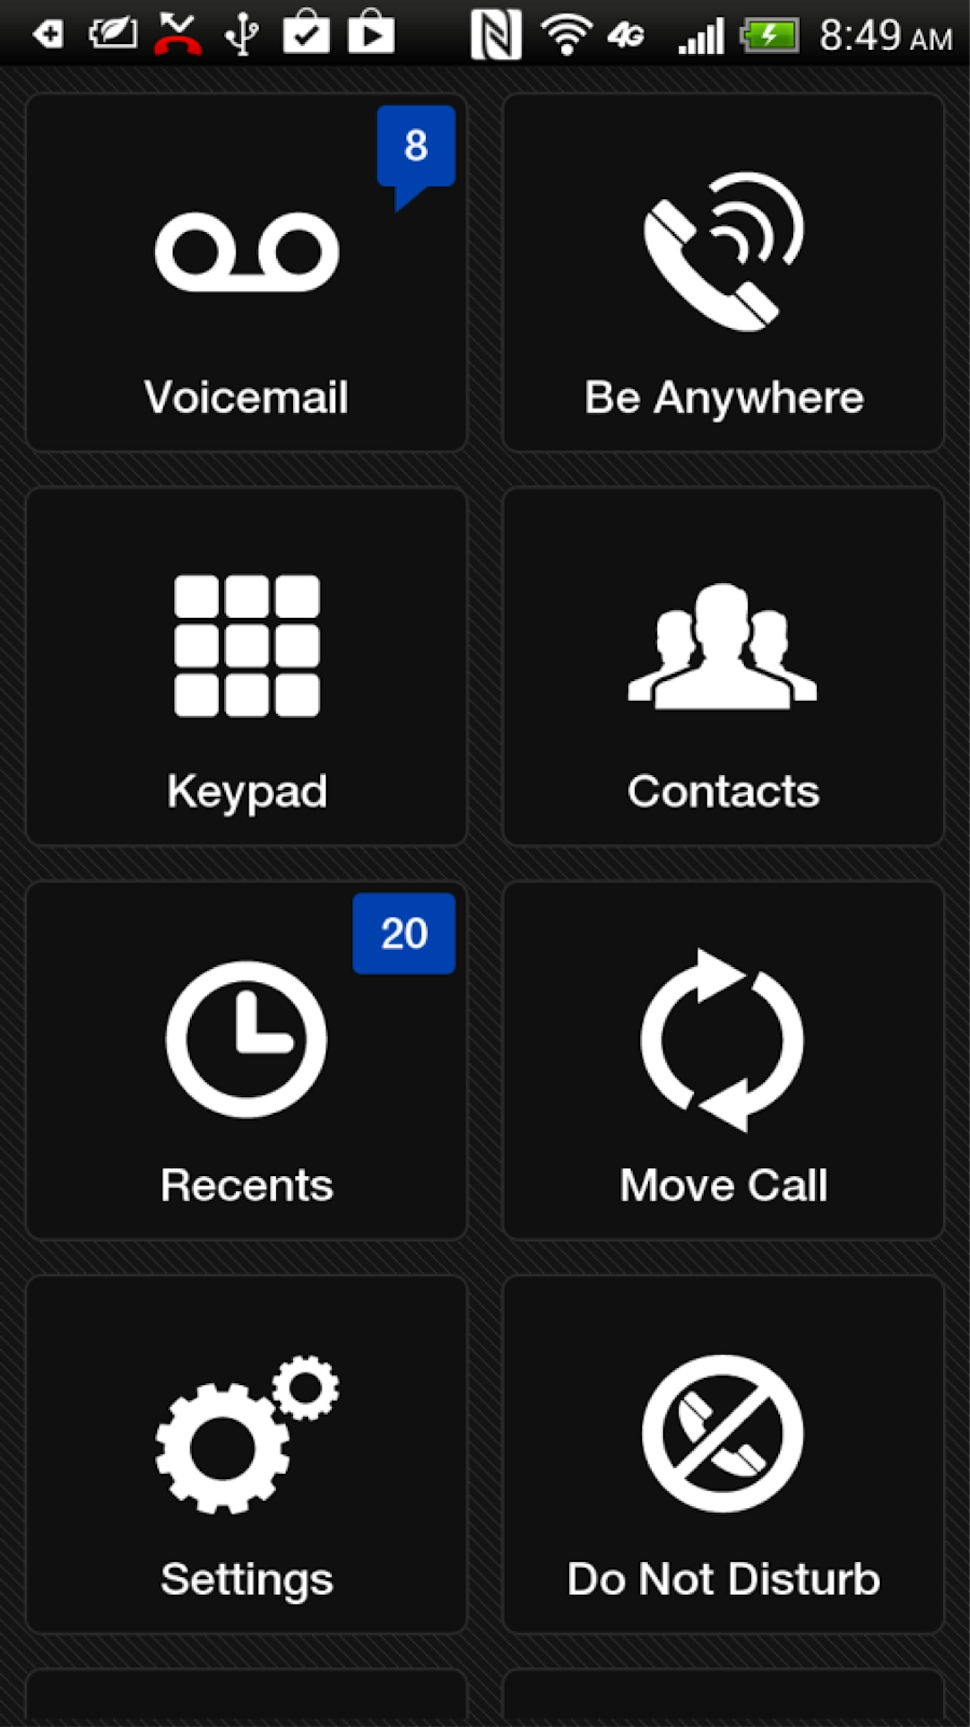 Communication modes